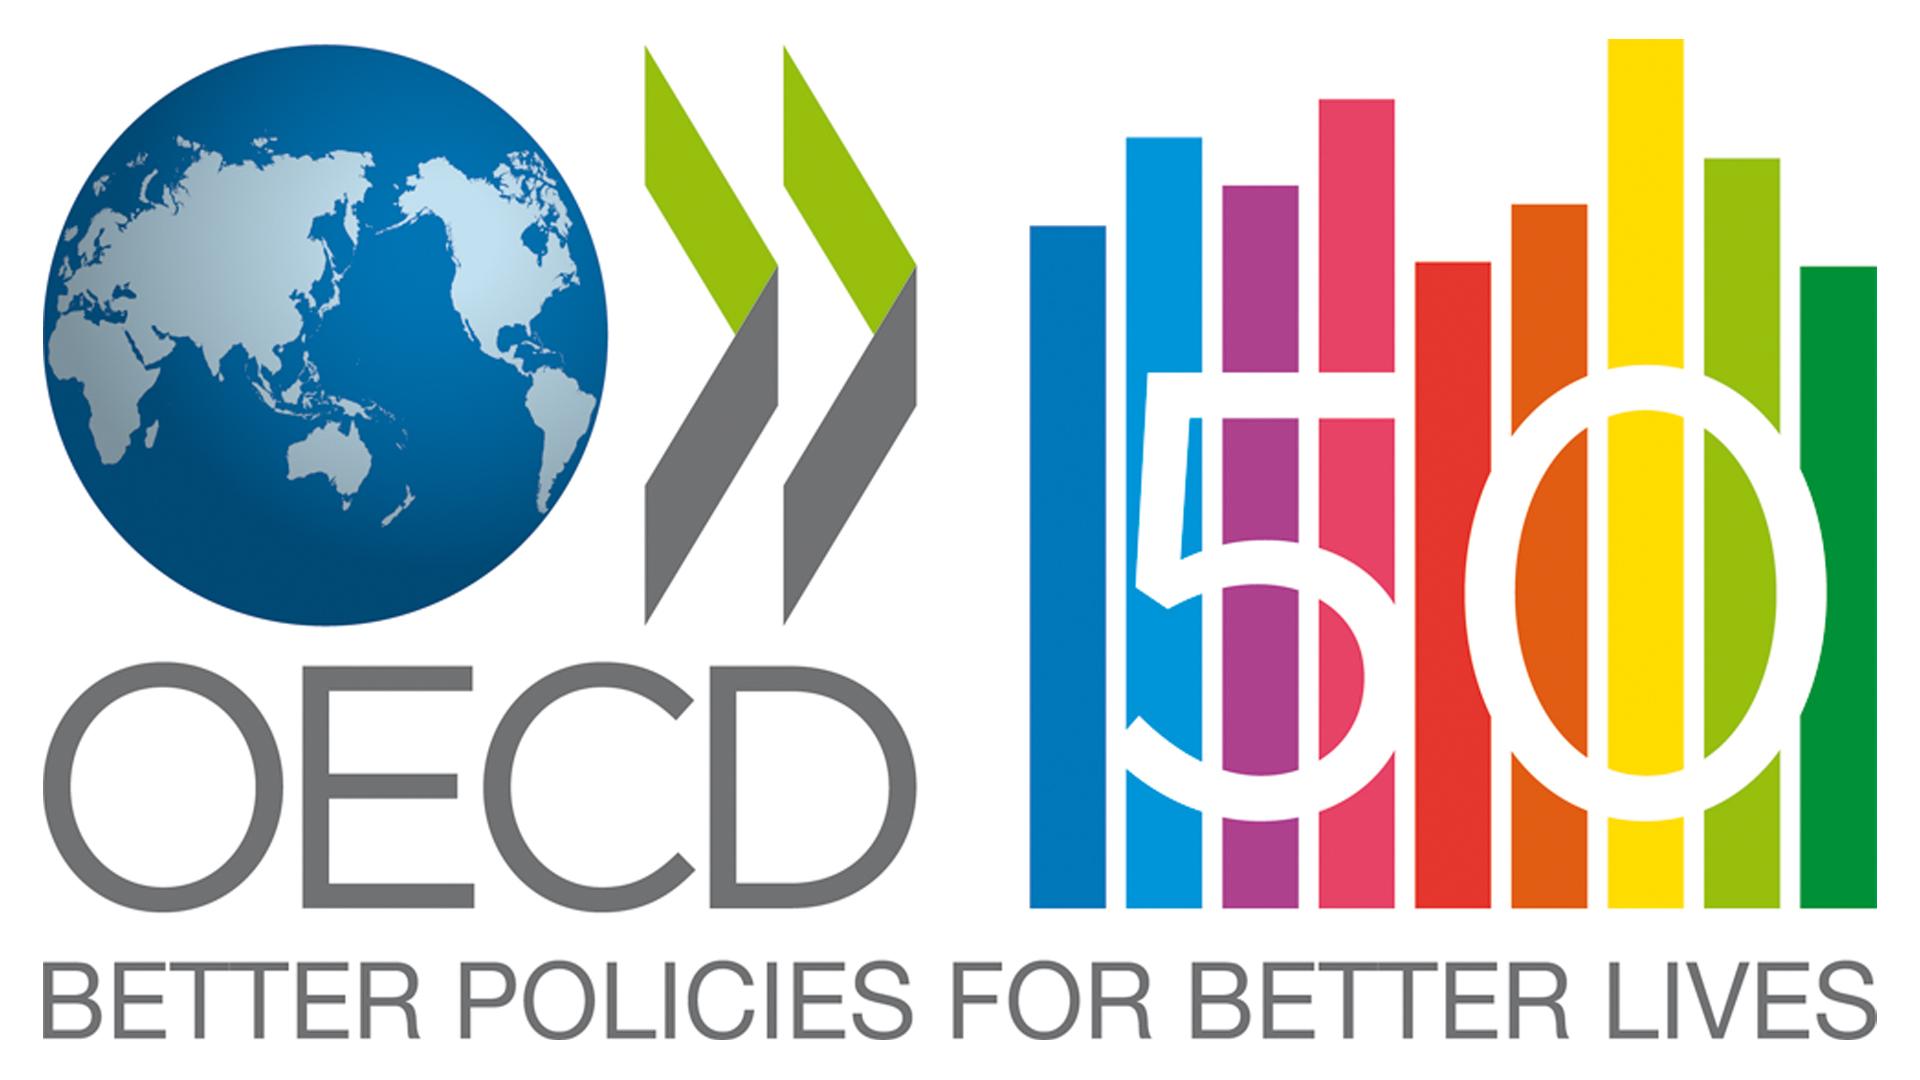 OECD image.jpg